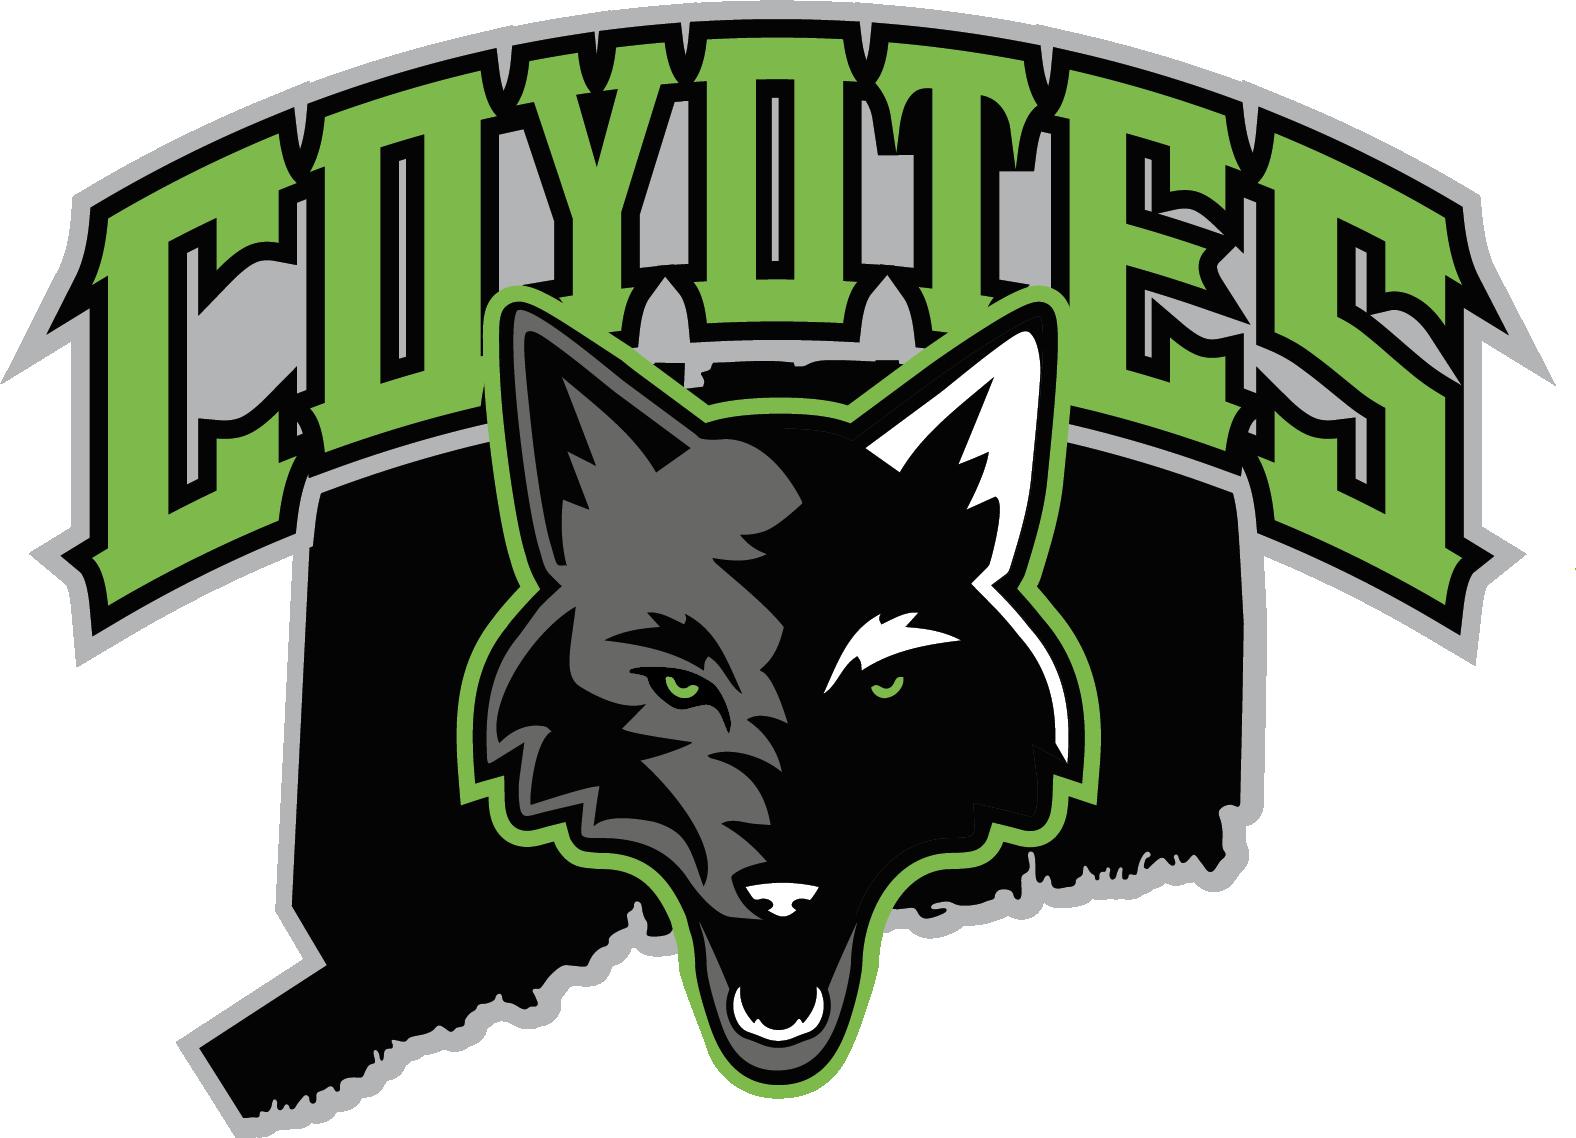 CTBLL_coyotes